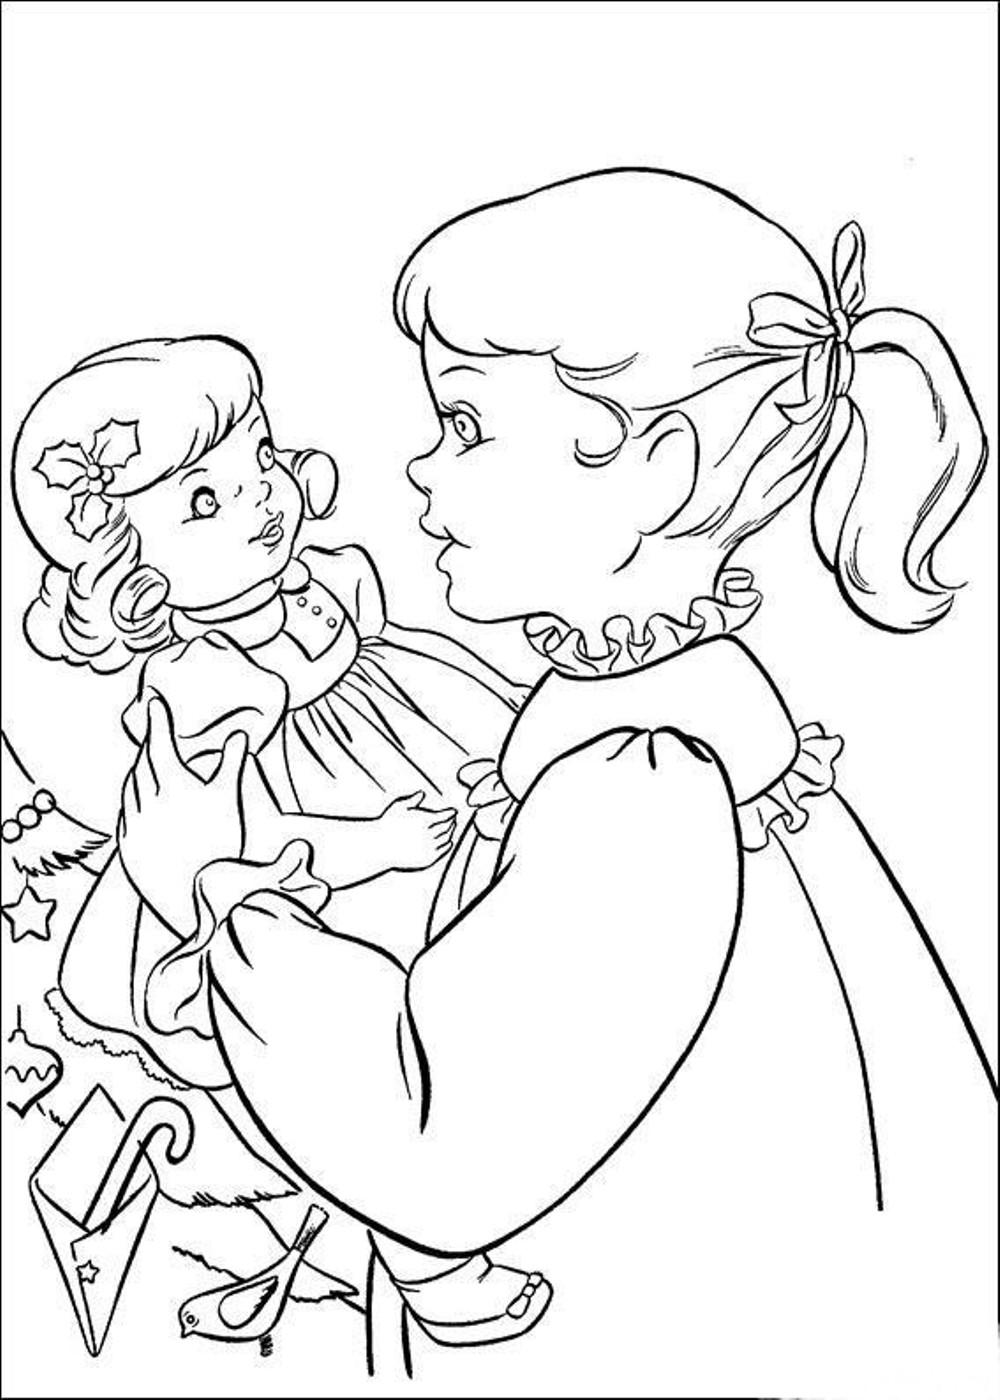 Coloring Sheets For Girls Printable Chistmas  Free Coloring Pages American Girl Kaya